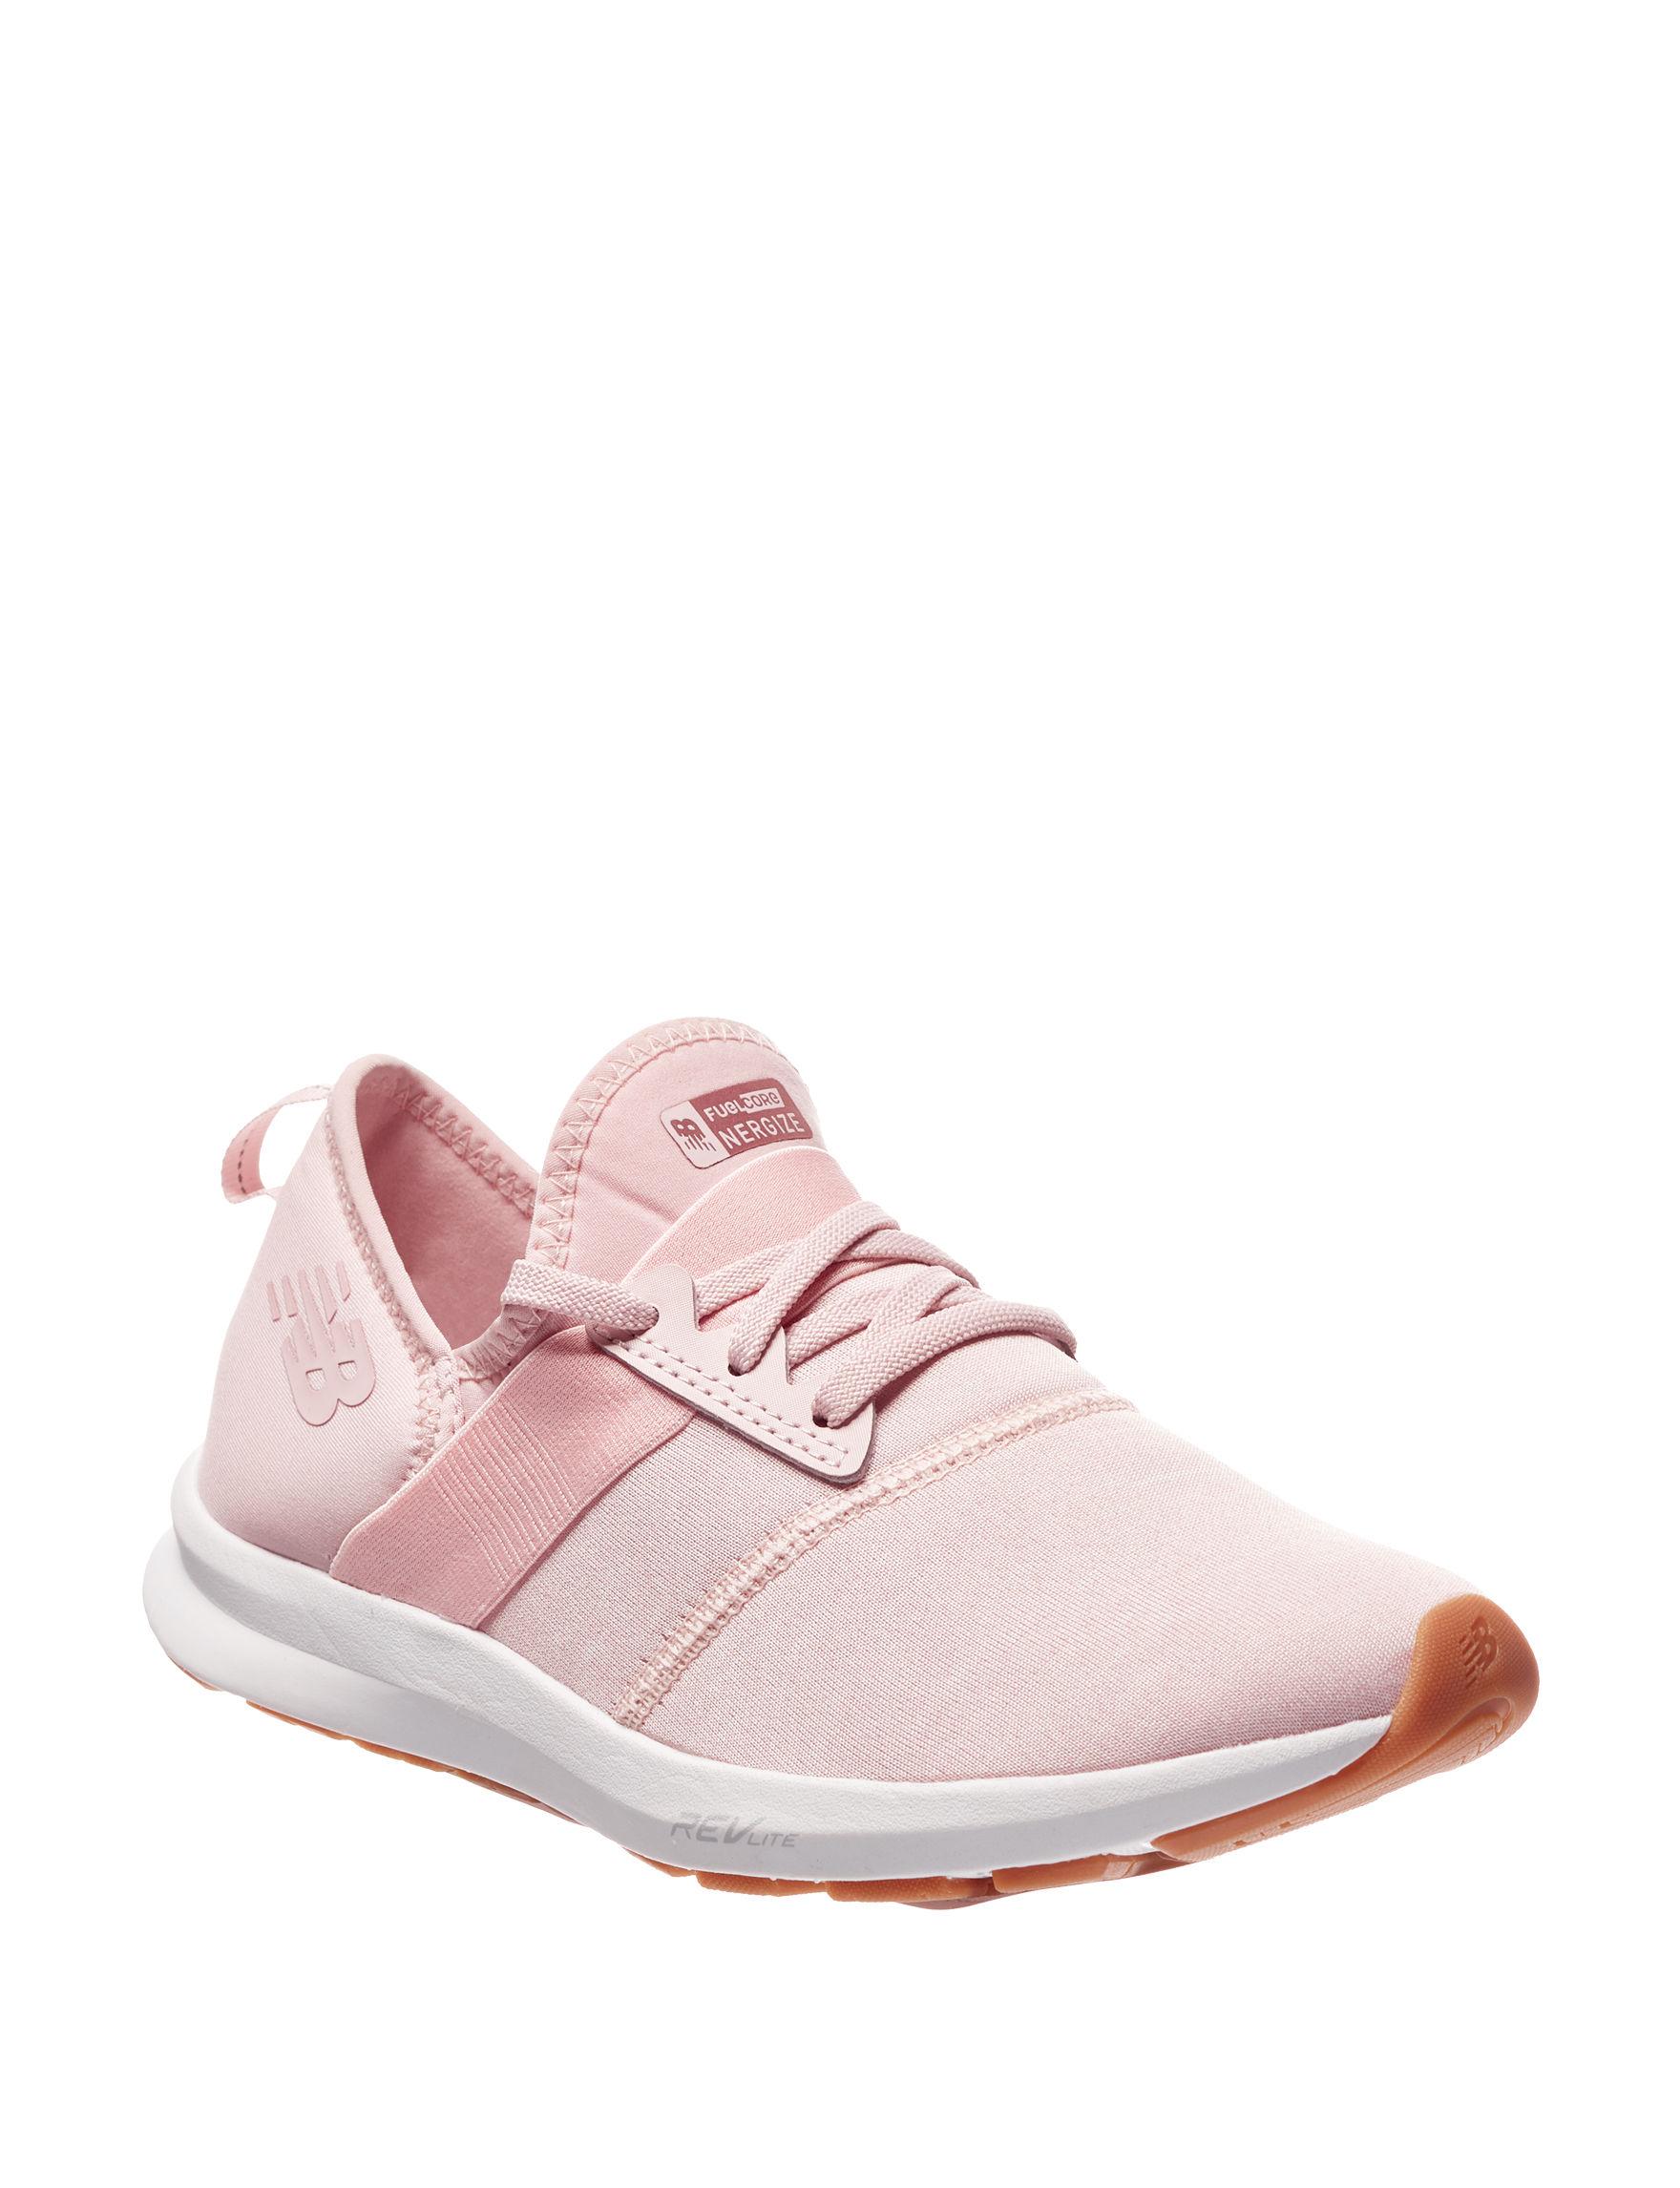 New Balance Pink Comfort Shoes